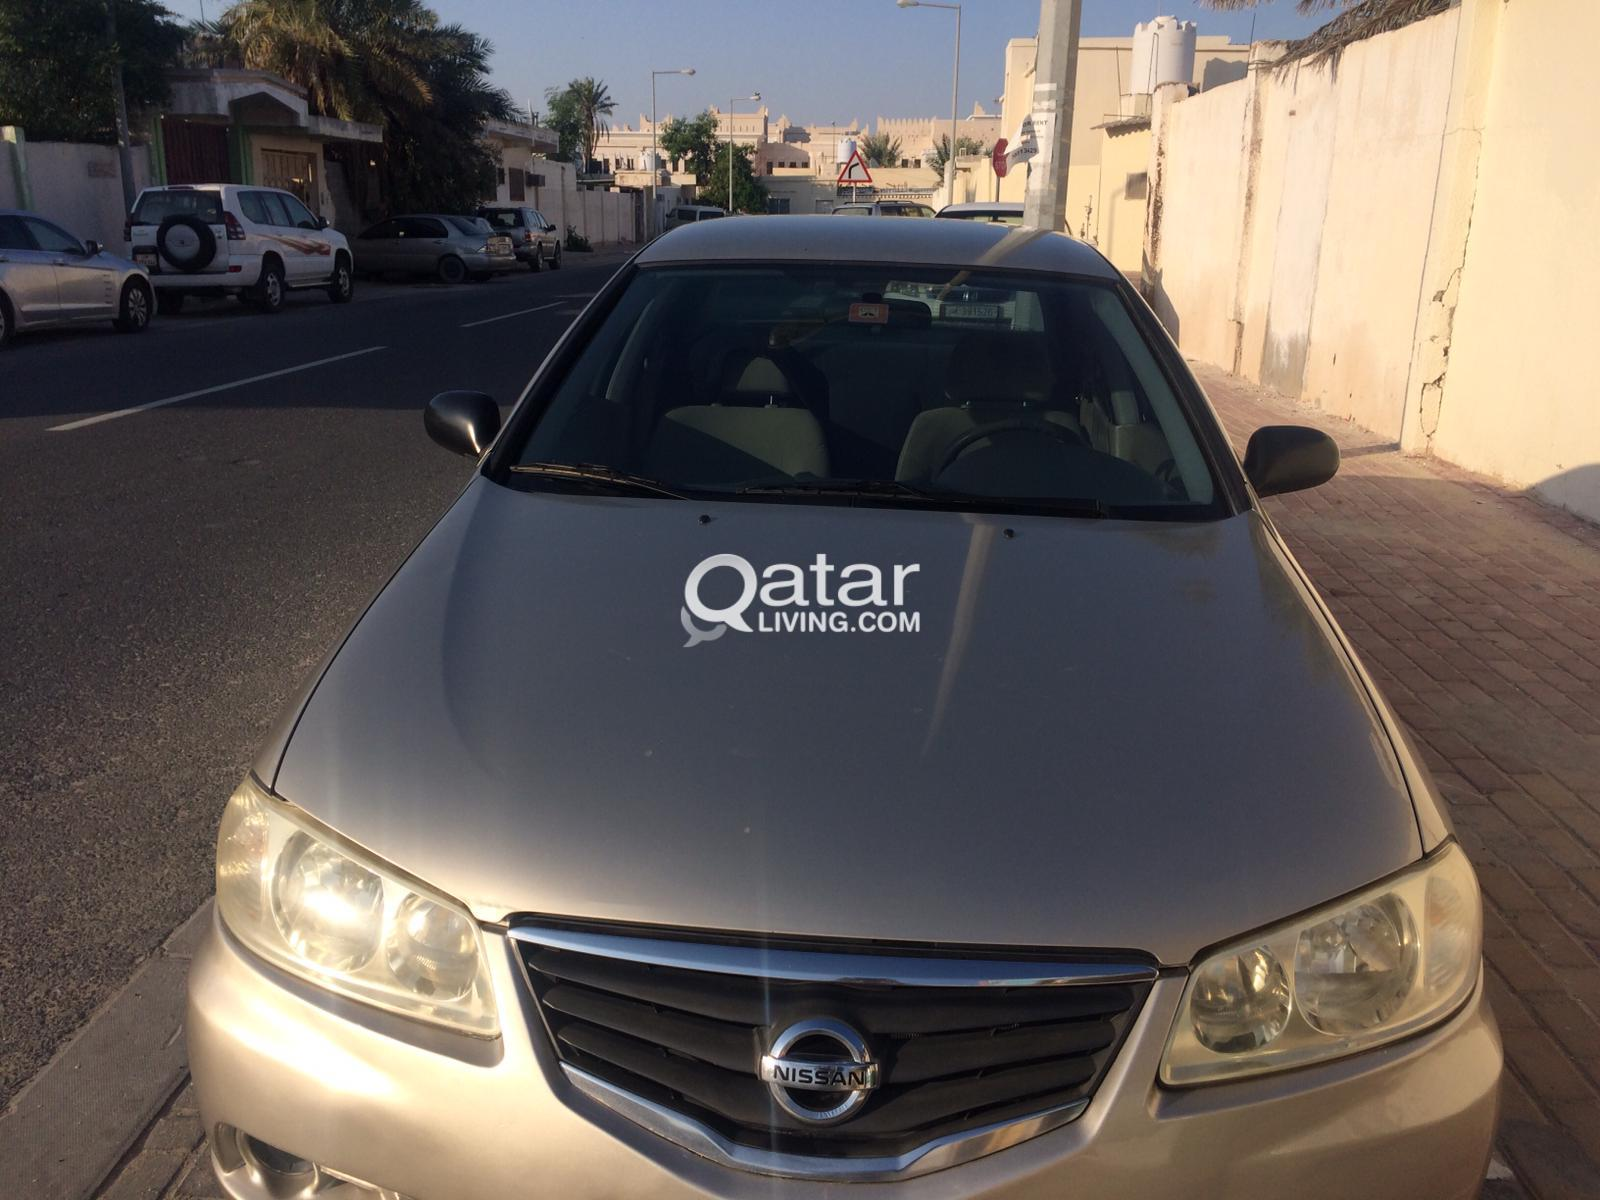 Nissan Sunny Japan 2011 Qatar Living